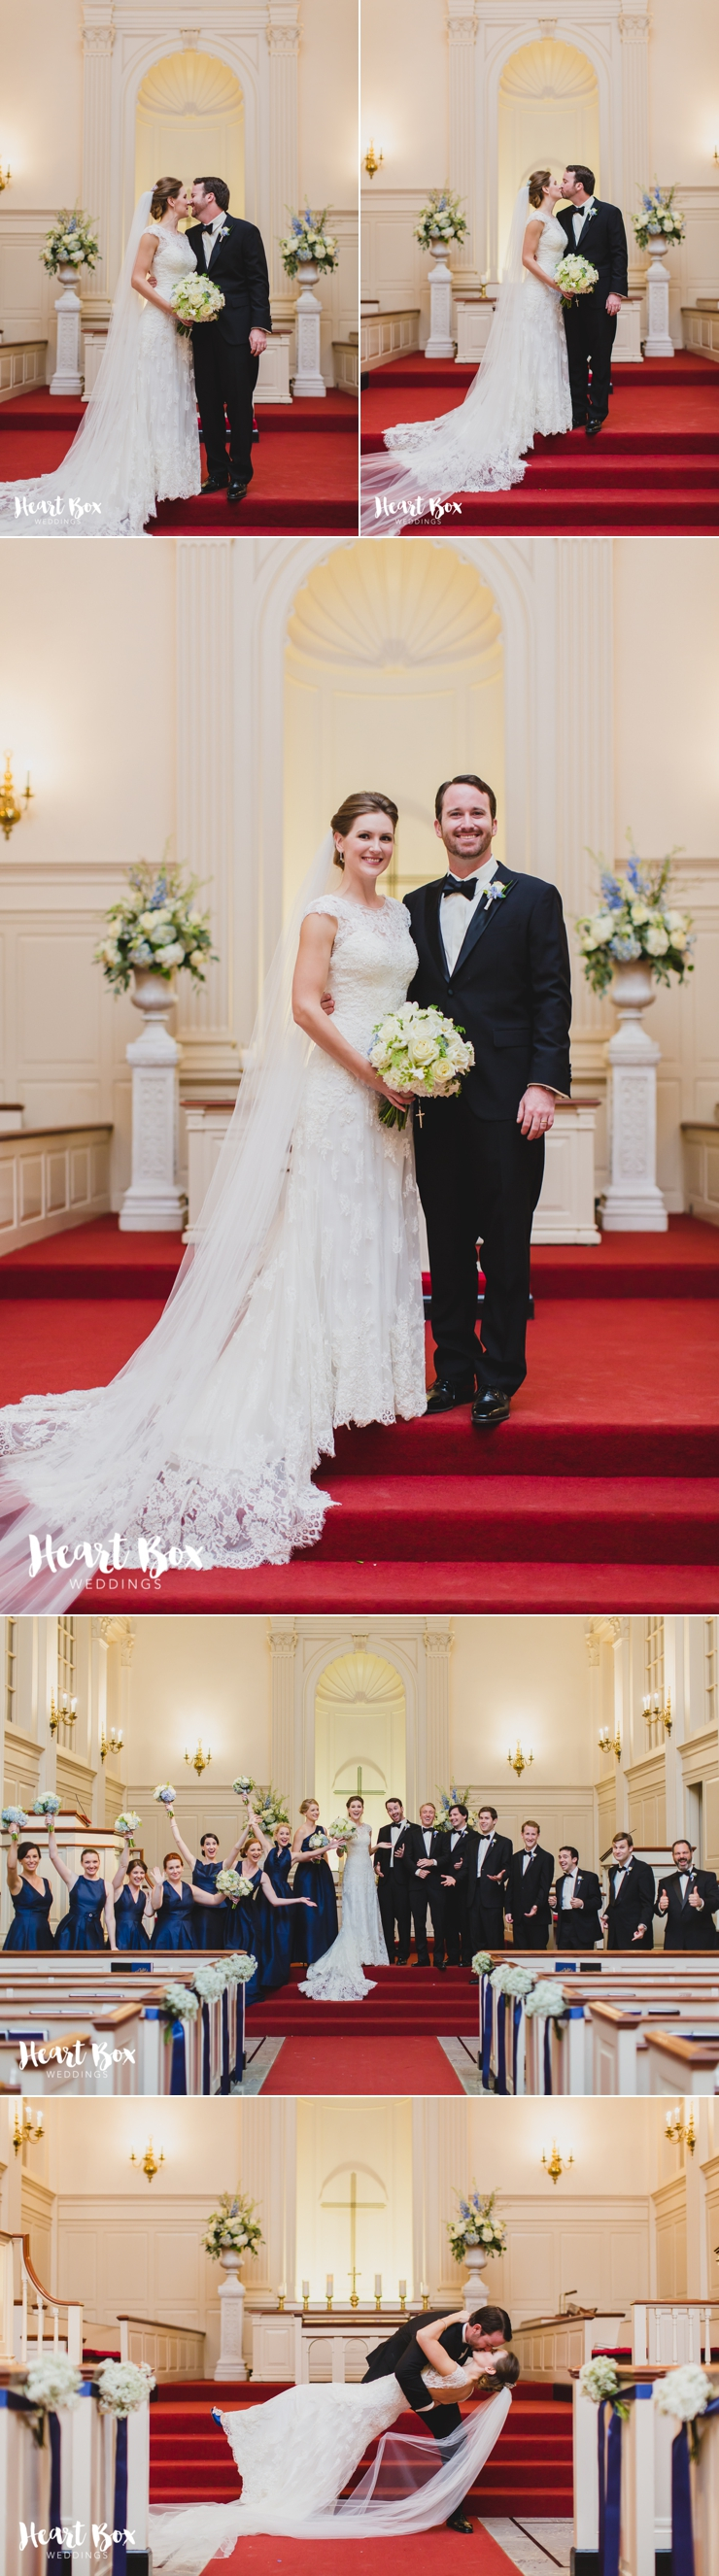 Anthony Wedding Blog Collages 15.jpg